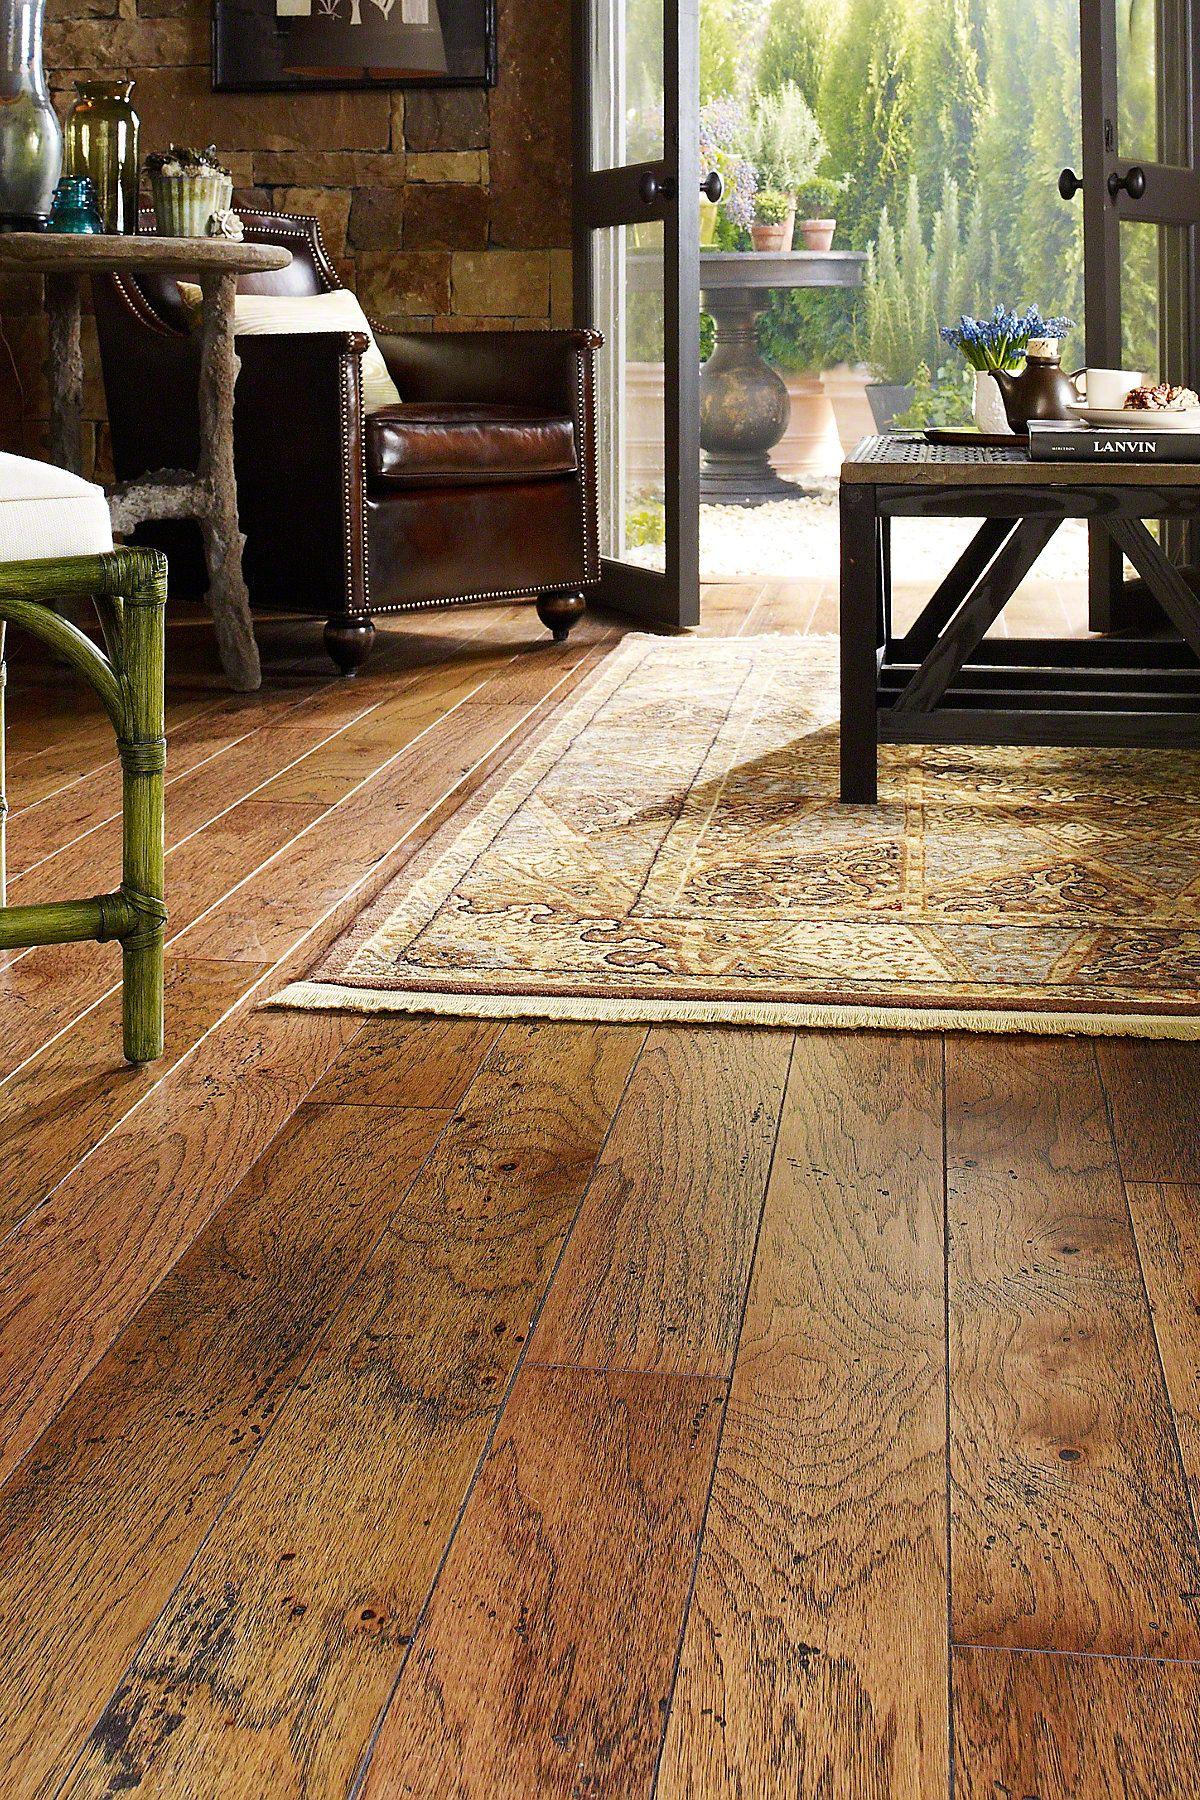 Albermarle Hickory Burnt Sugar Sa000 00881 Hardwoods Sample Shaw Floors Hickory Hardwood Floors Hickory Flooring Flooring